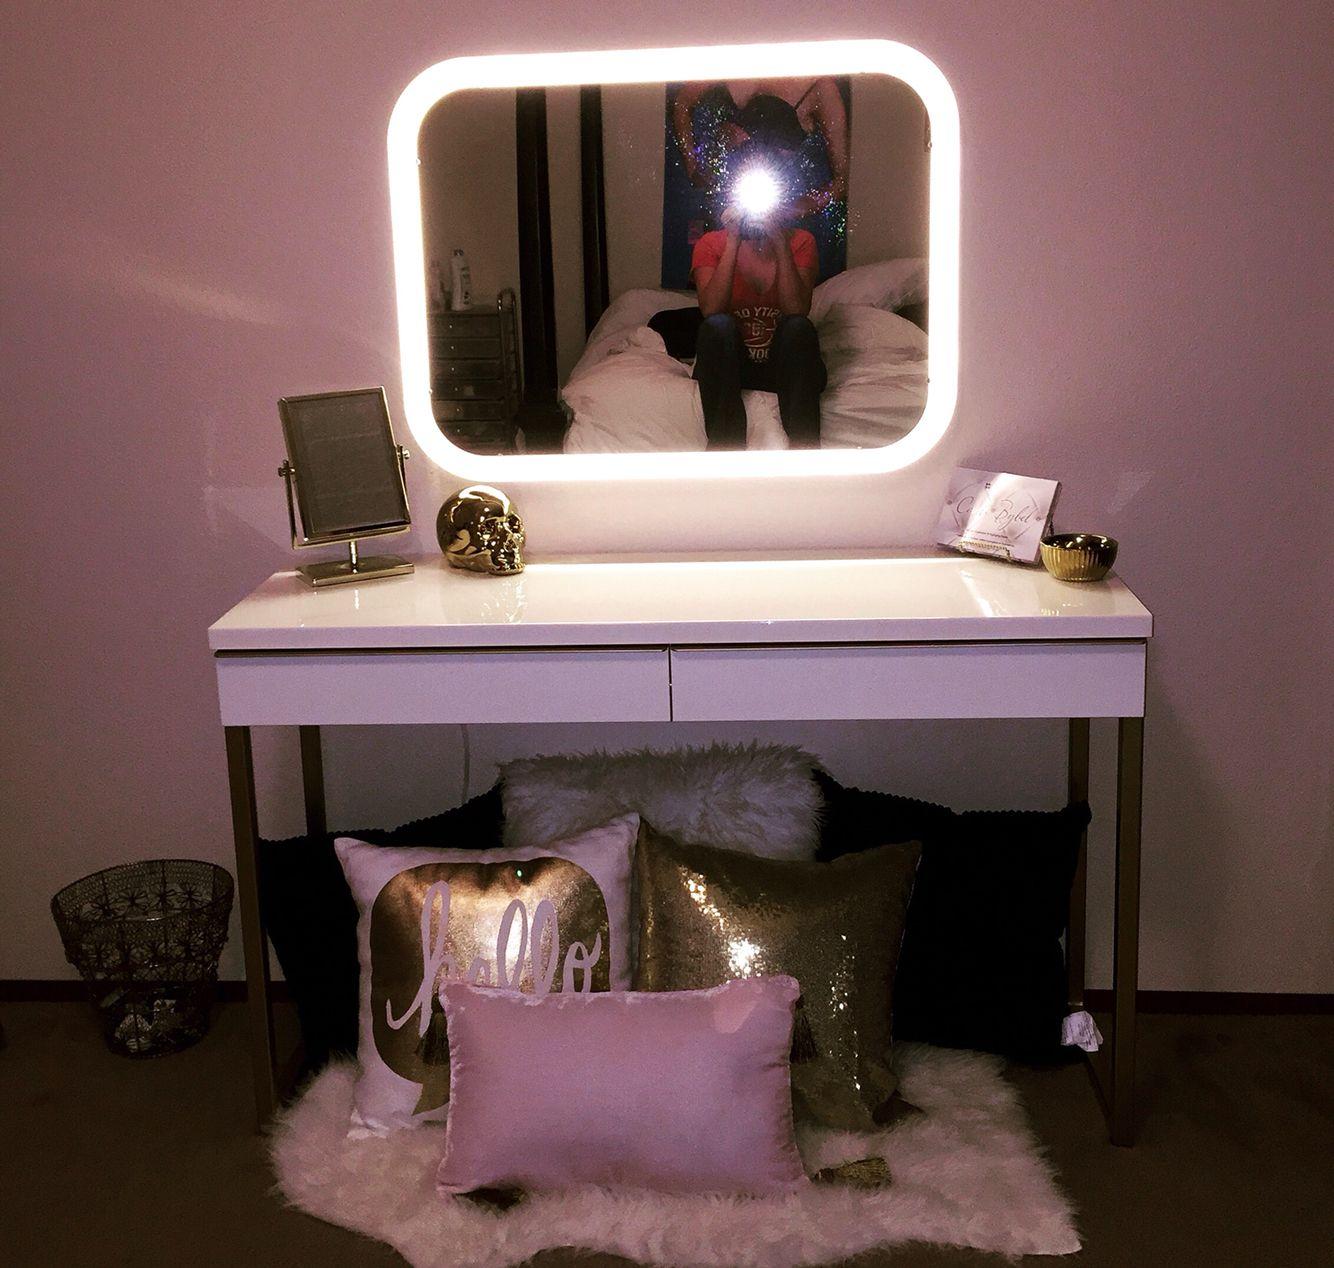 Vanity •IKEA Besta Burs Desk Storjorm Mirror Tejn Rug • Hobby